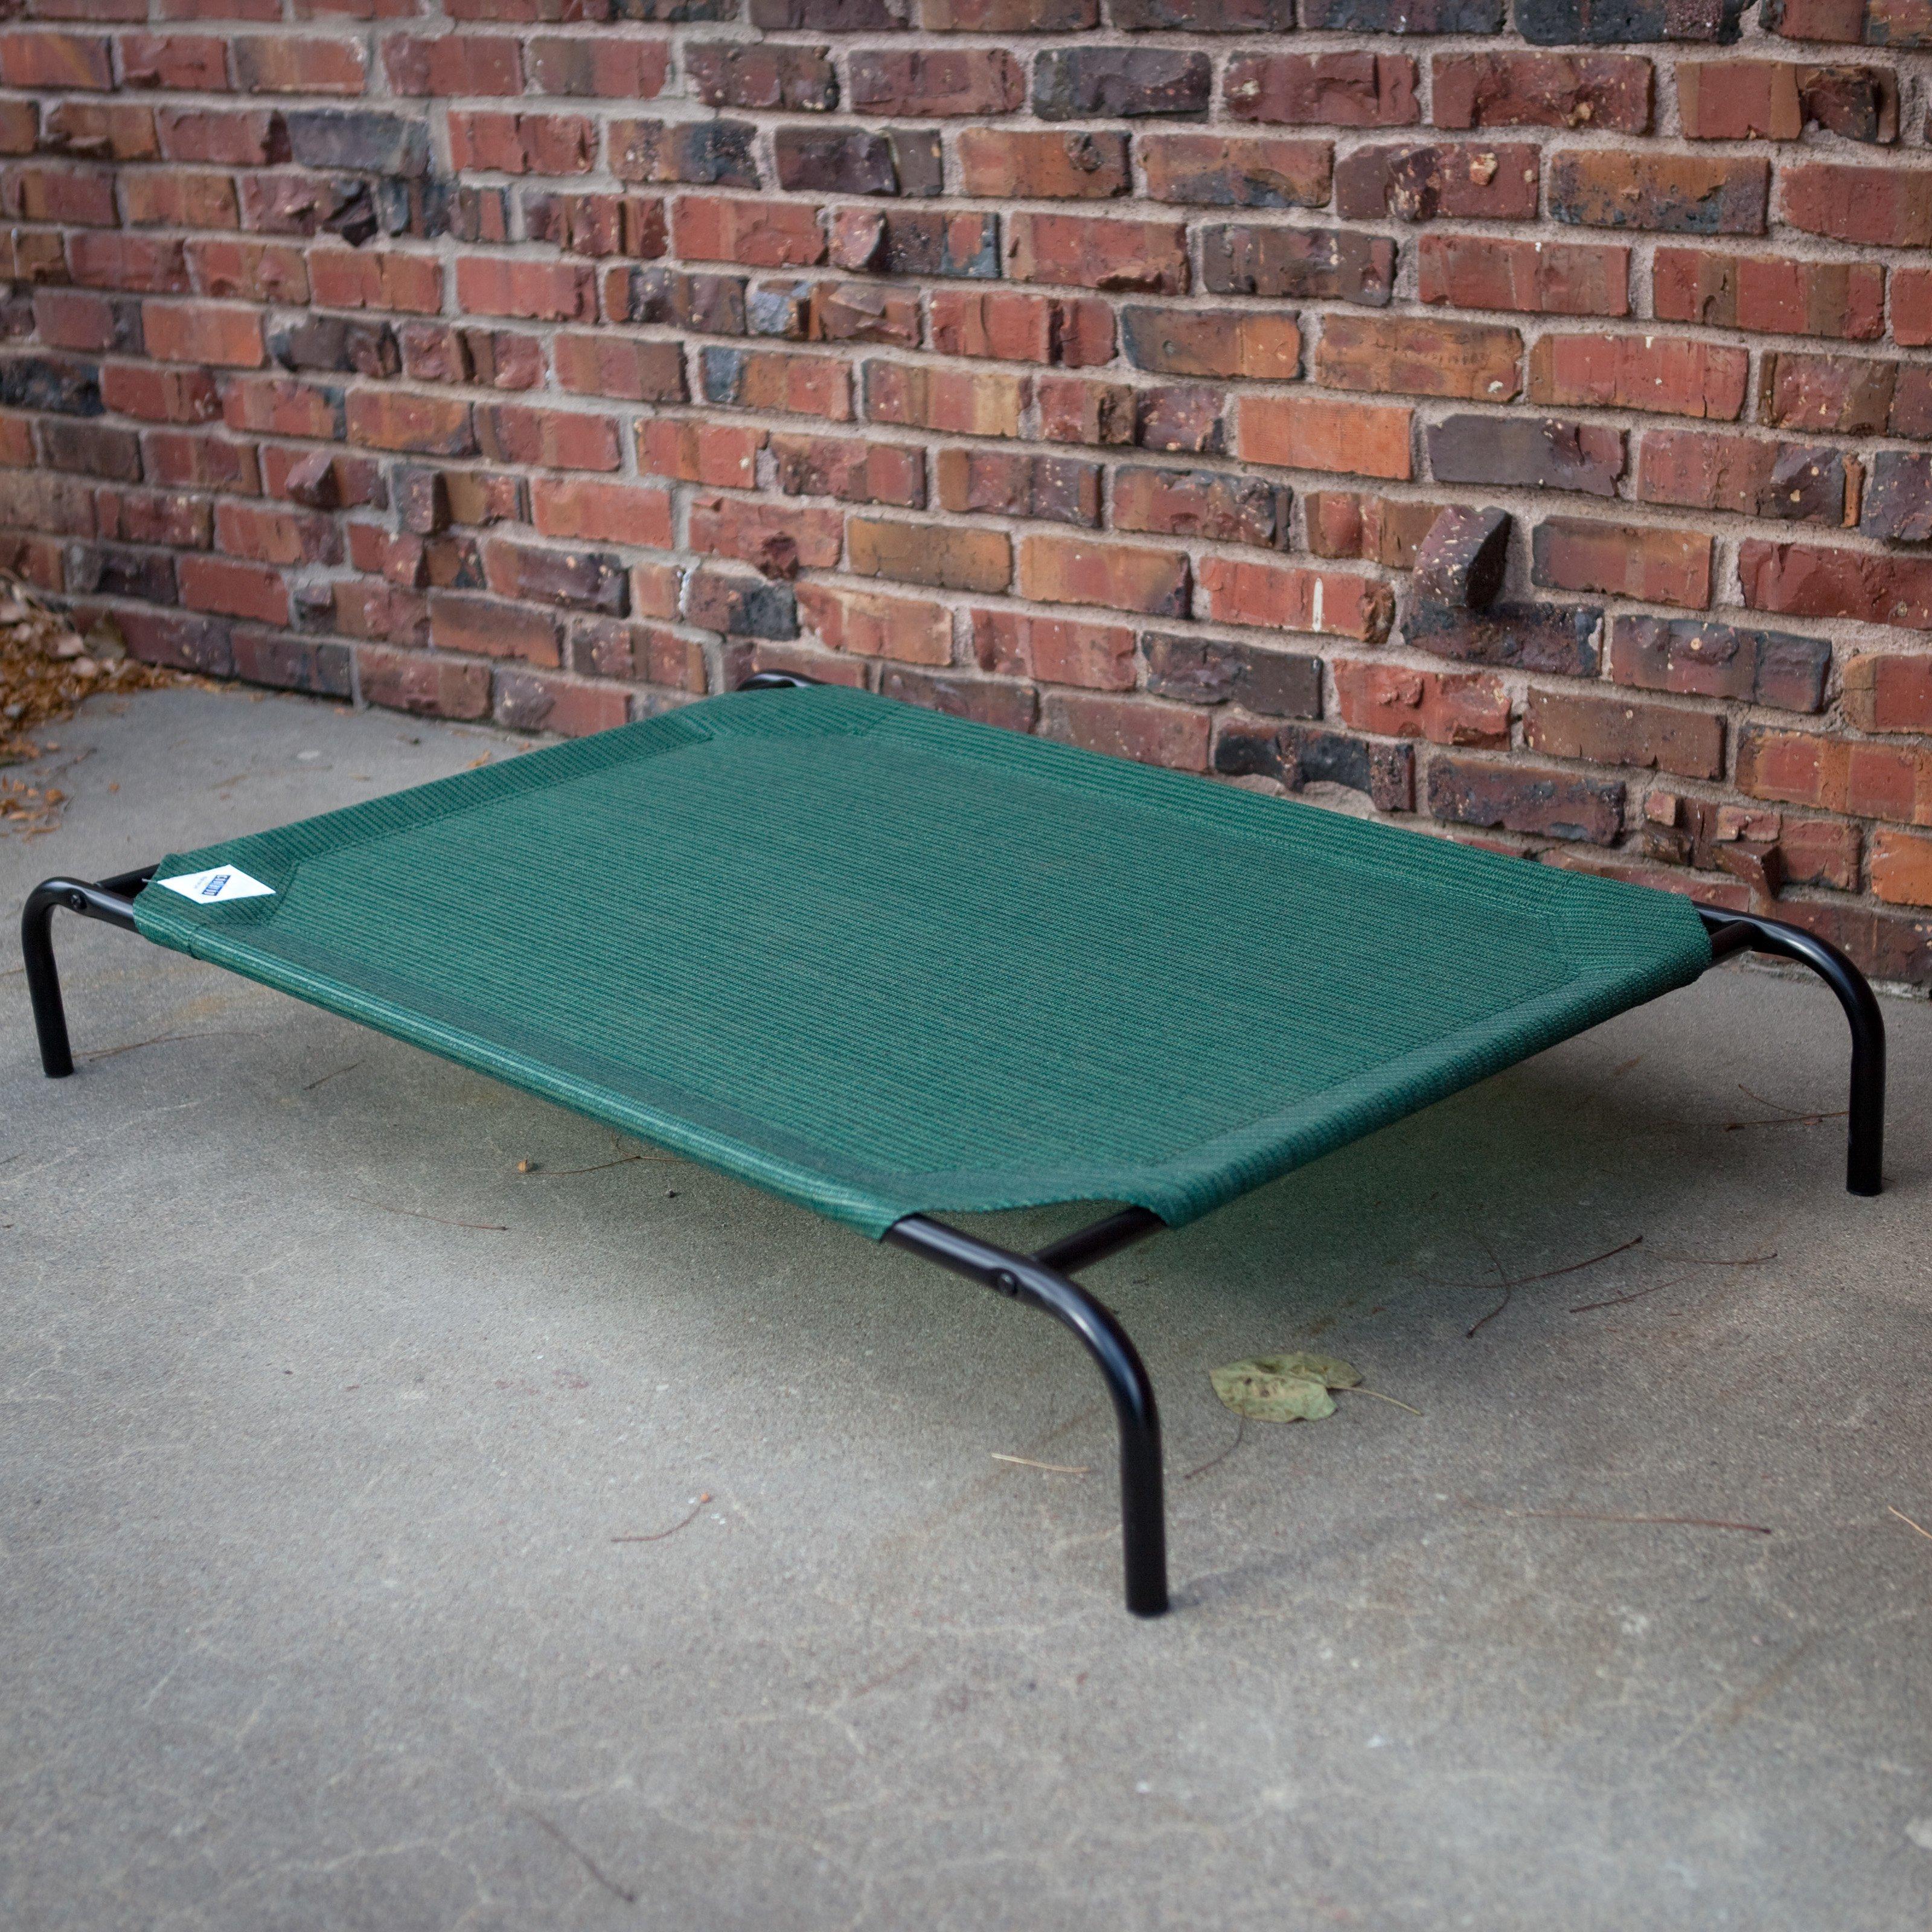 Coolaroo Elevated Pet Bed - Medium - Brunswick Green @ Amazon $13.99